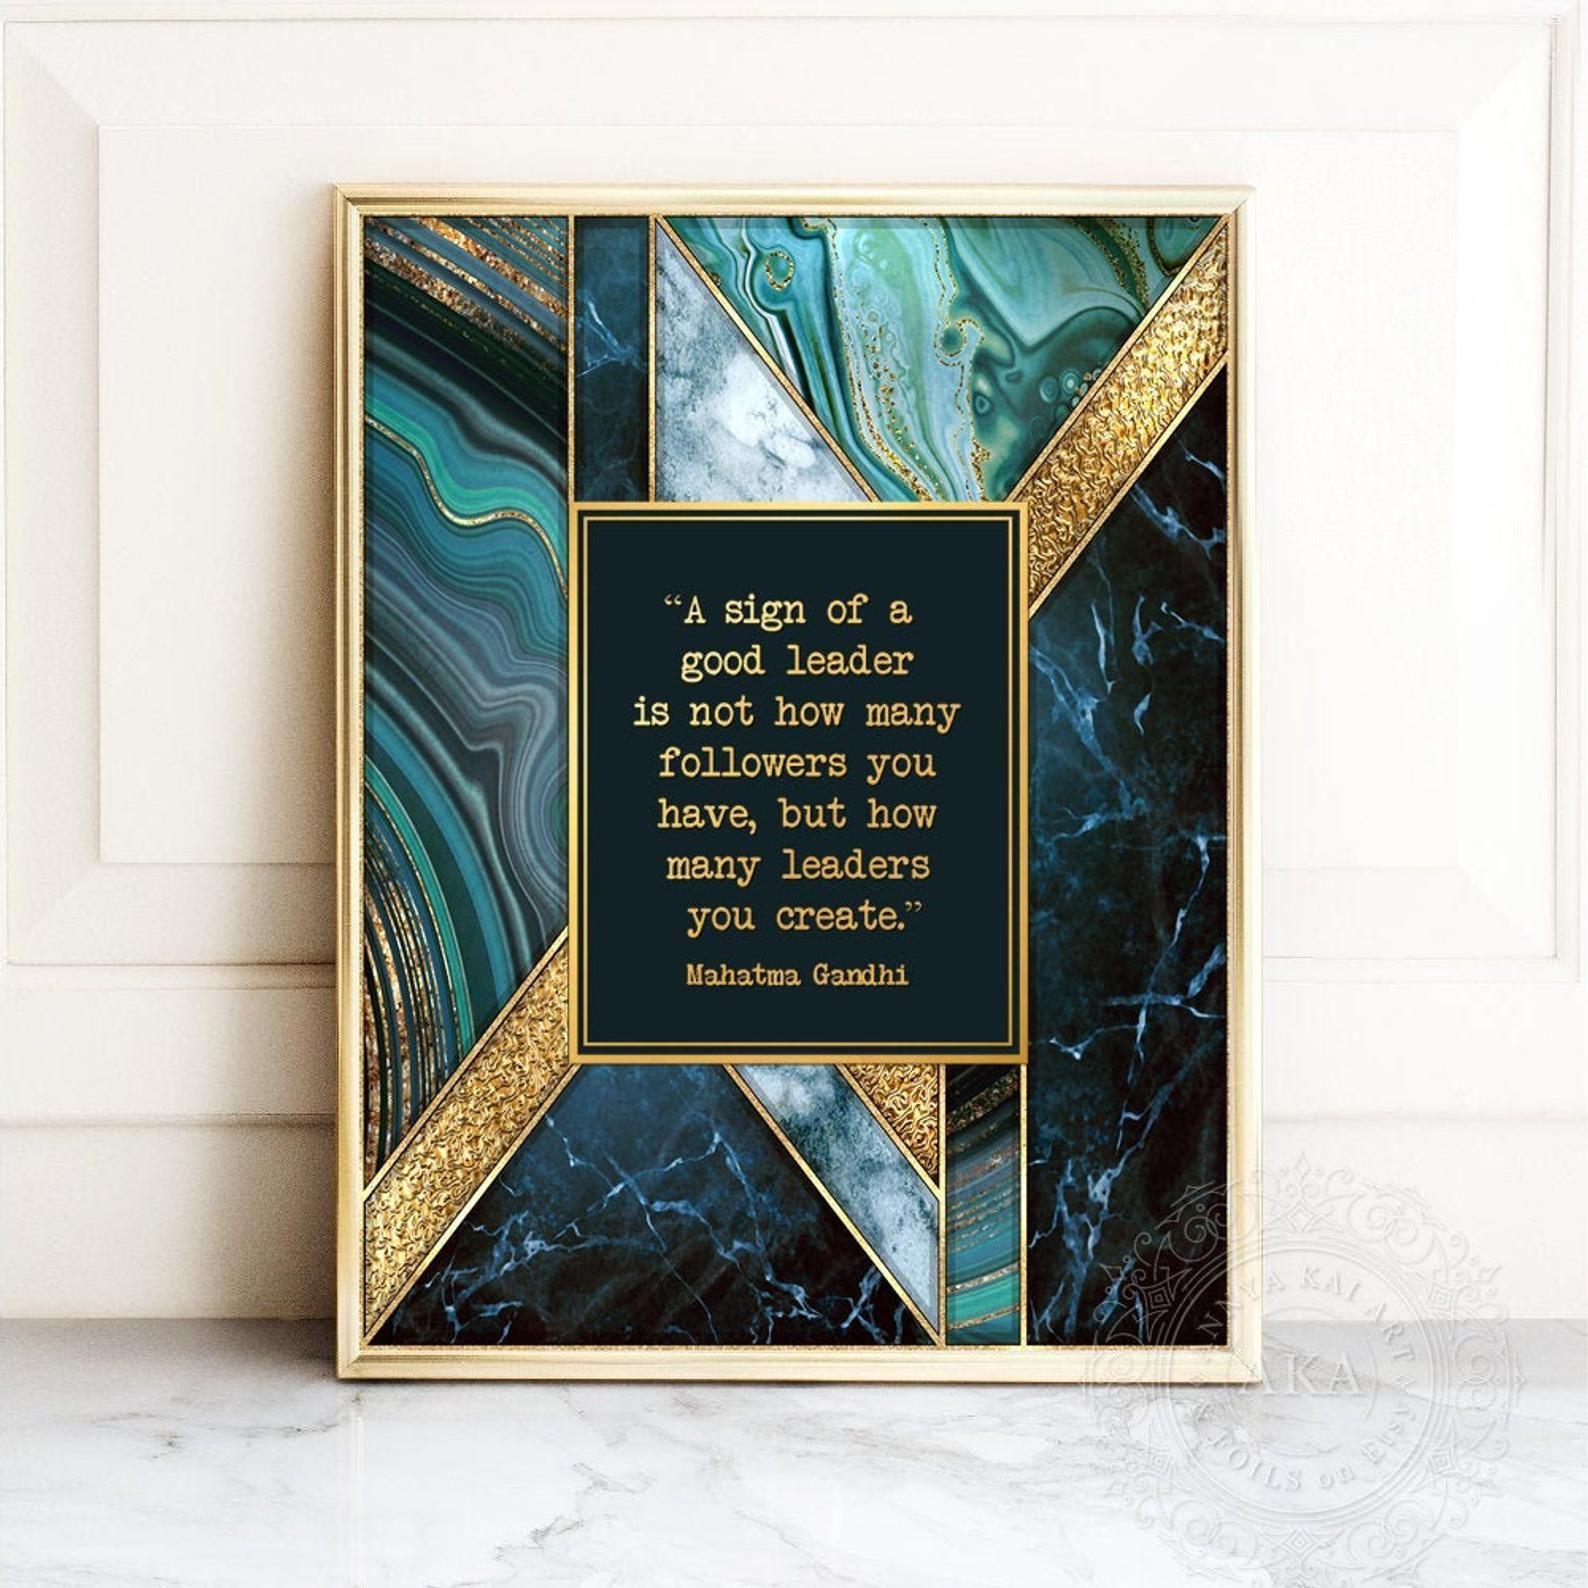 Mentor gift thank you gift for mentor mahatma gandhi